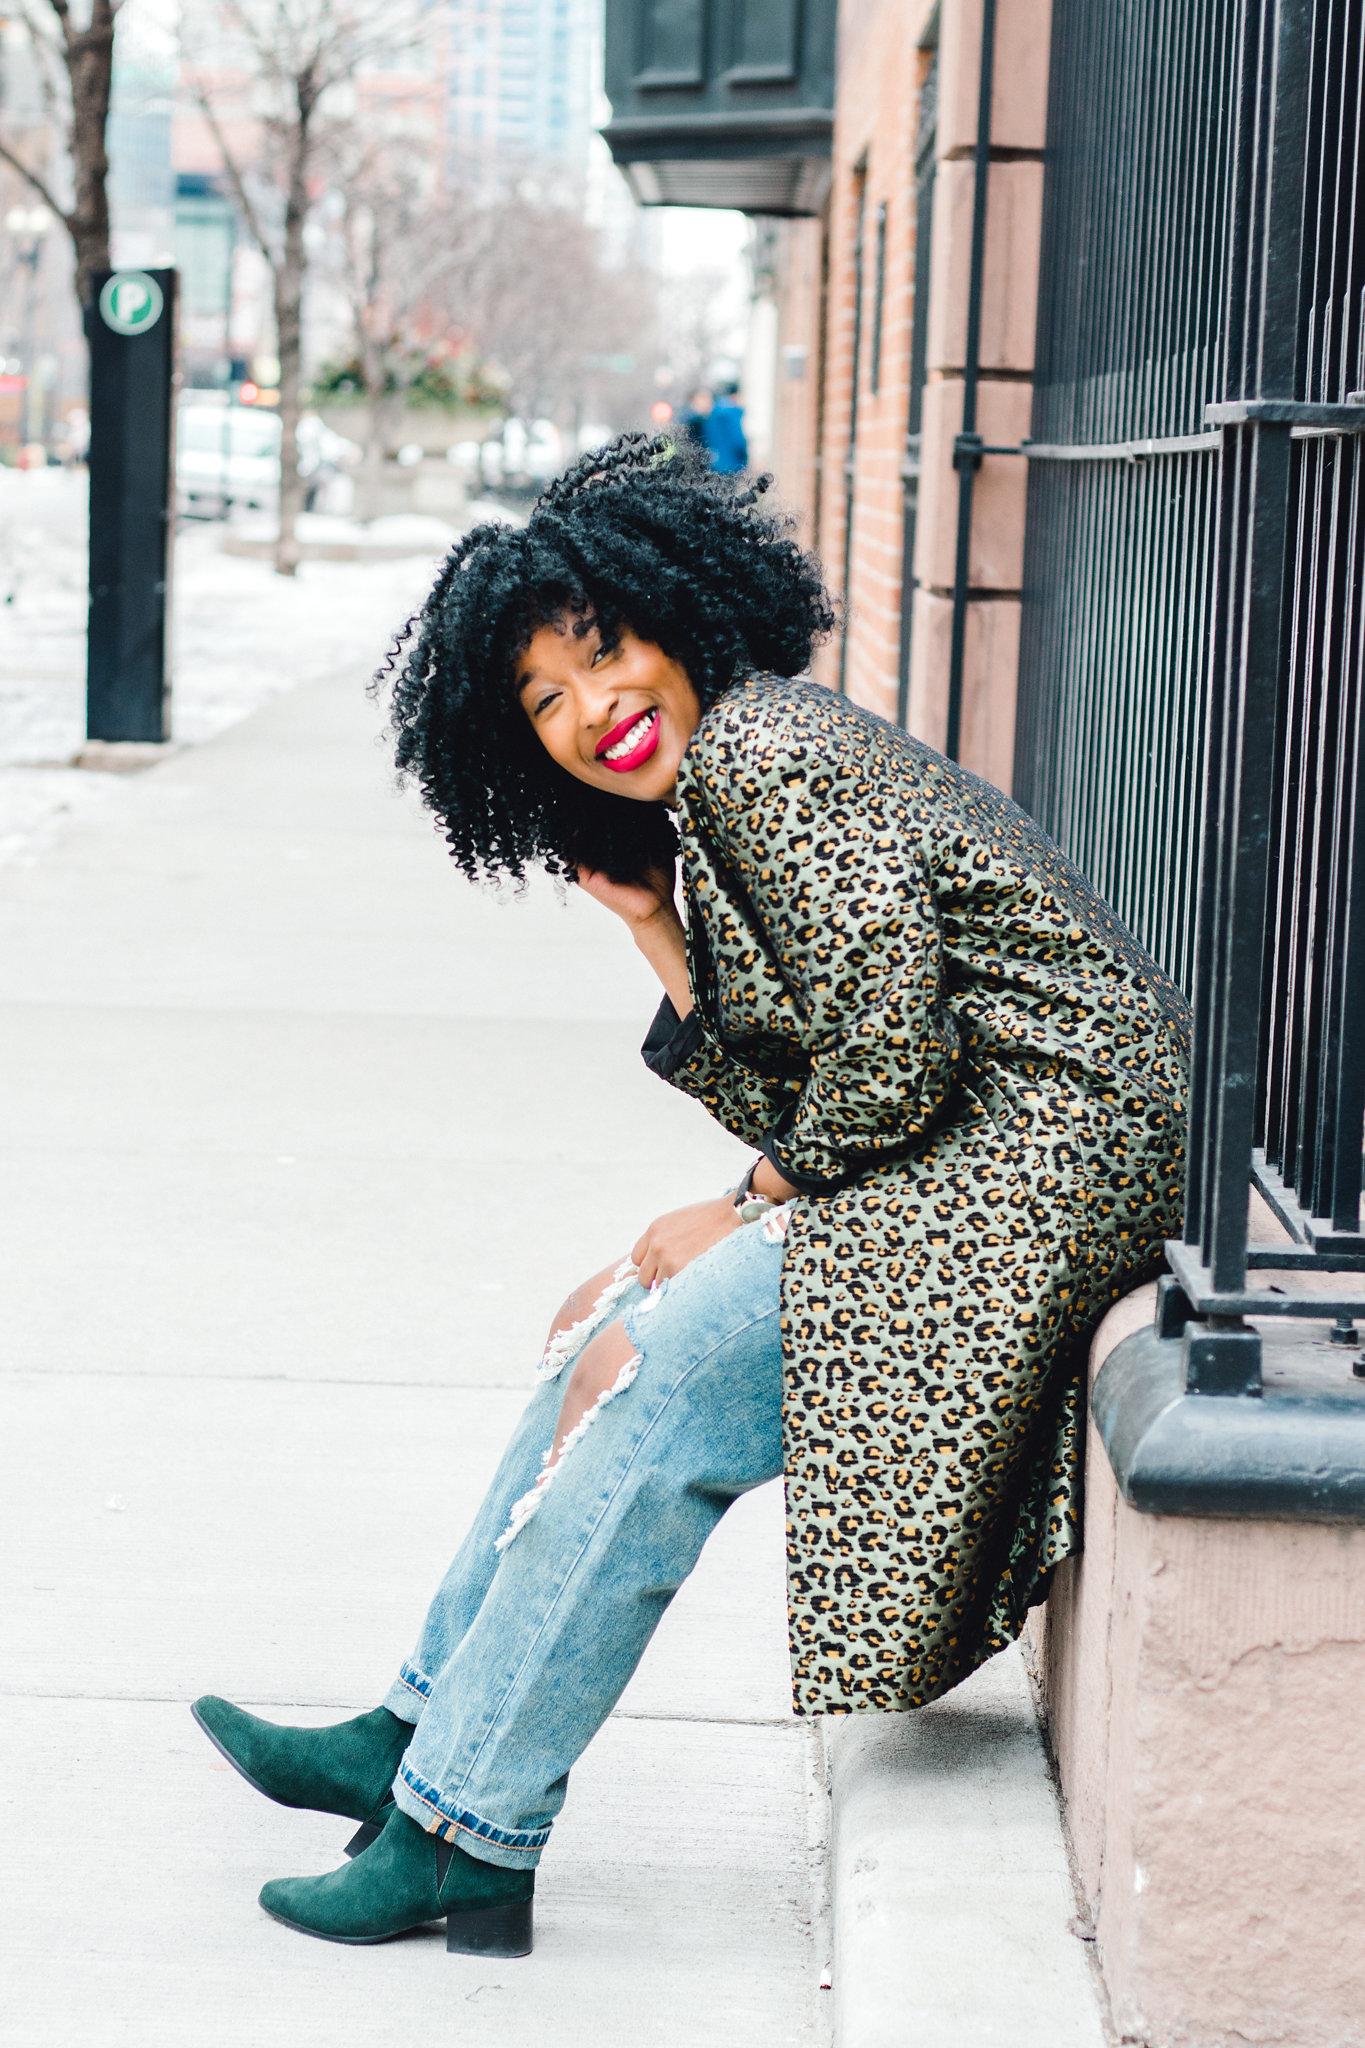 mom jeans, leopard blazer, natural hair, black fashion blogger